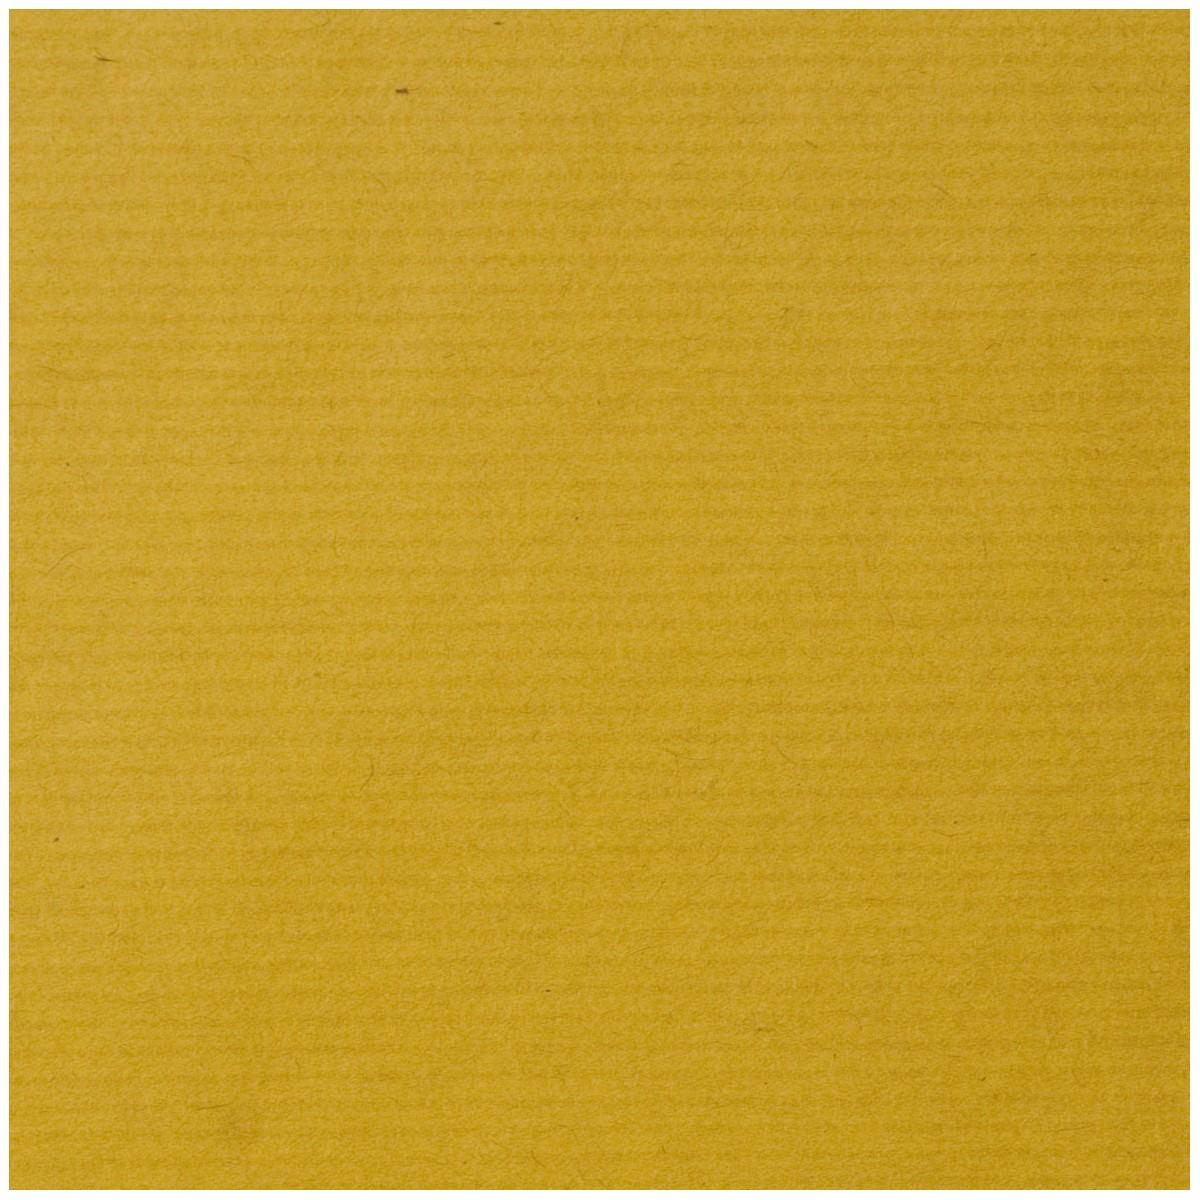 Carta Sealing Avana ECOBROWN Gr.60 Fogli Cm.70x100 Colori Tinta Unita (al Kg.) Giallo